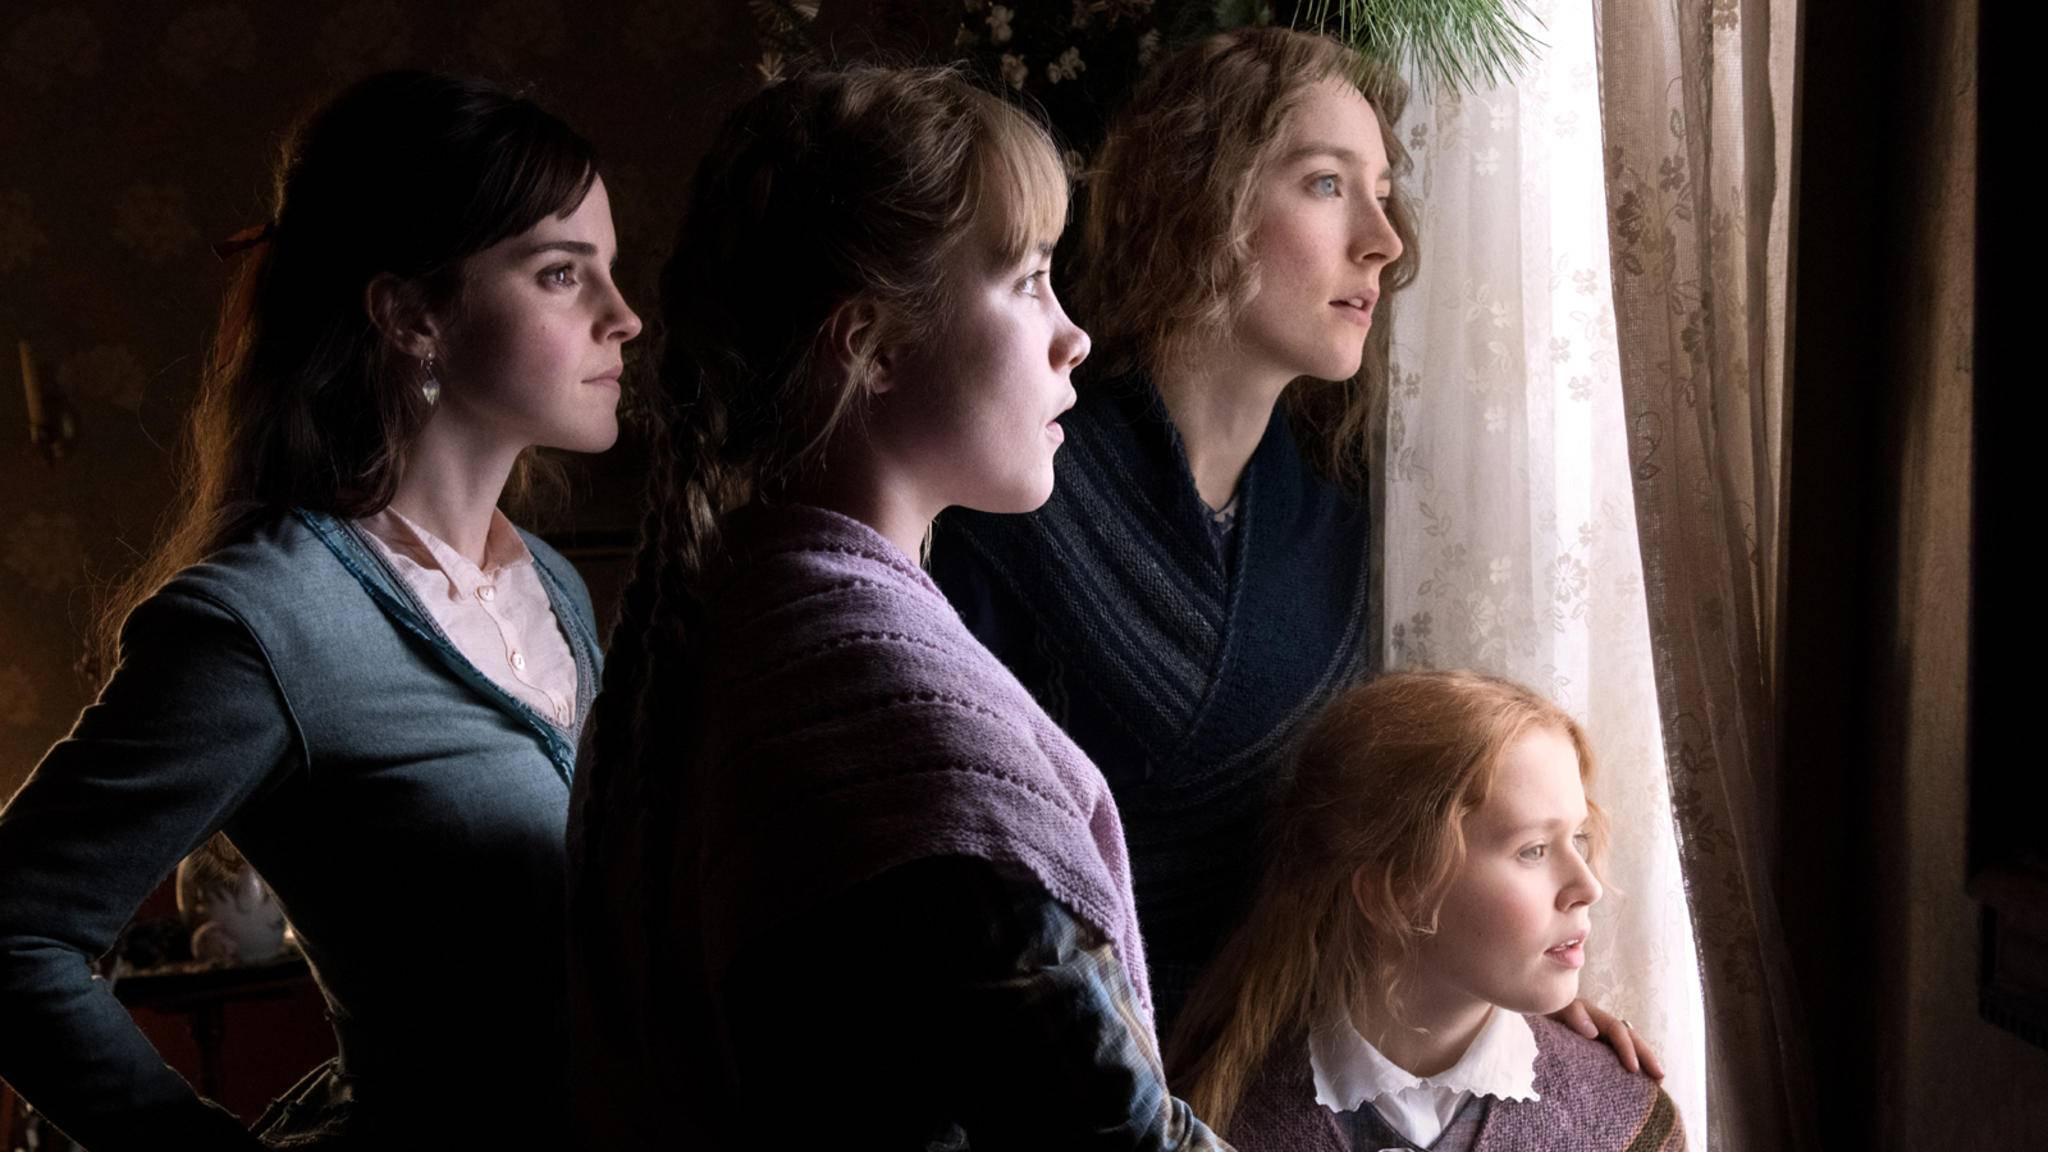 little women, Emma Watson, Florence Pugh, Saoirse Ronan, Eliza Scanlen